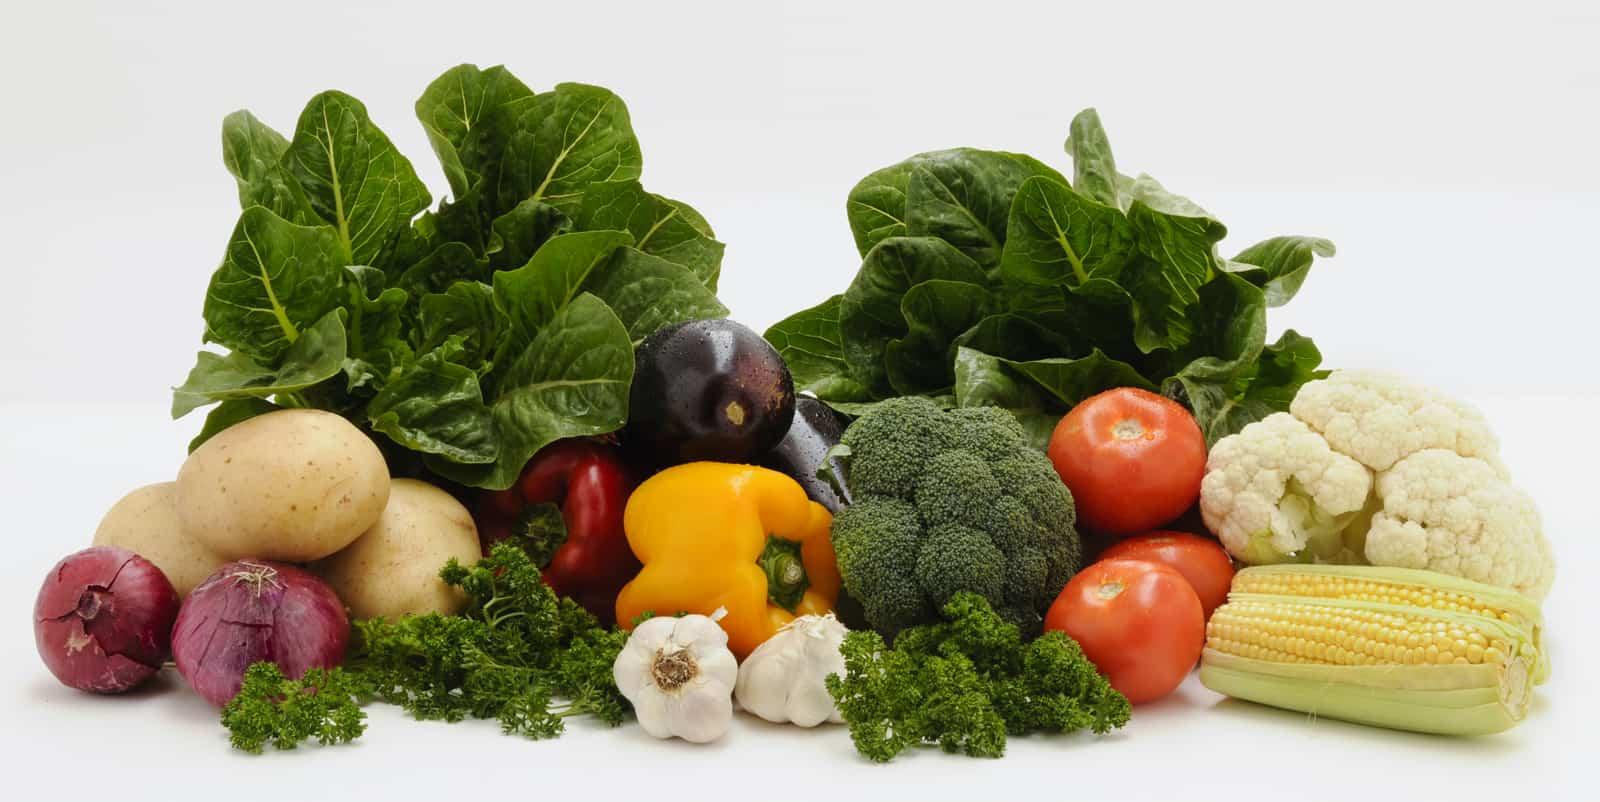 organic your lifestyle gardening lifestyle home garden